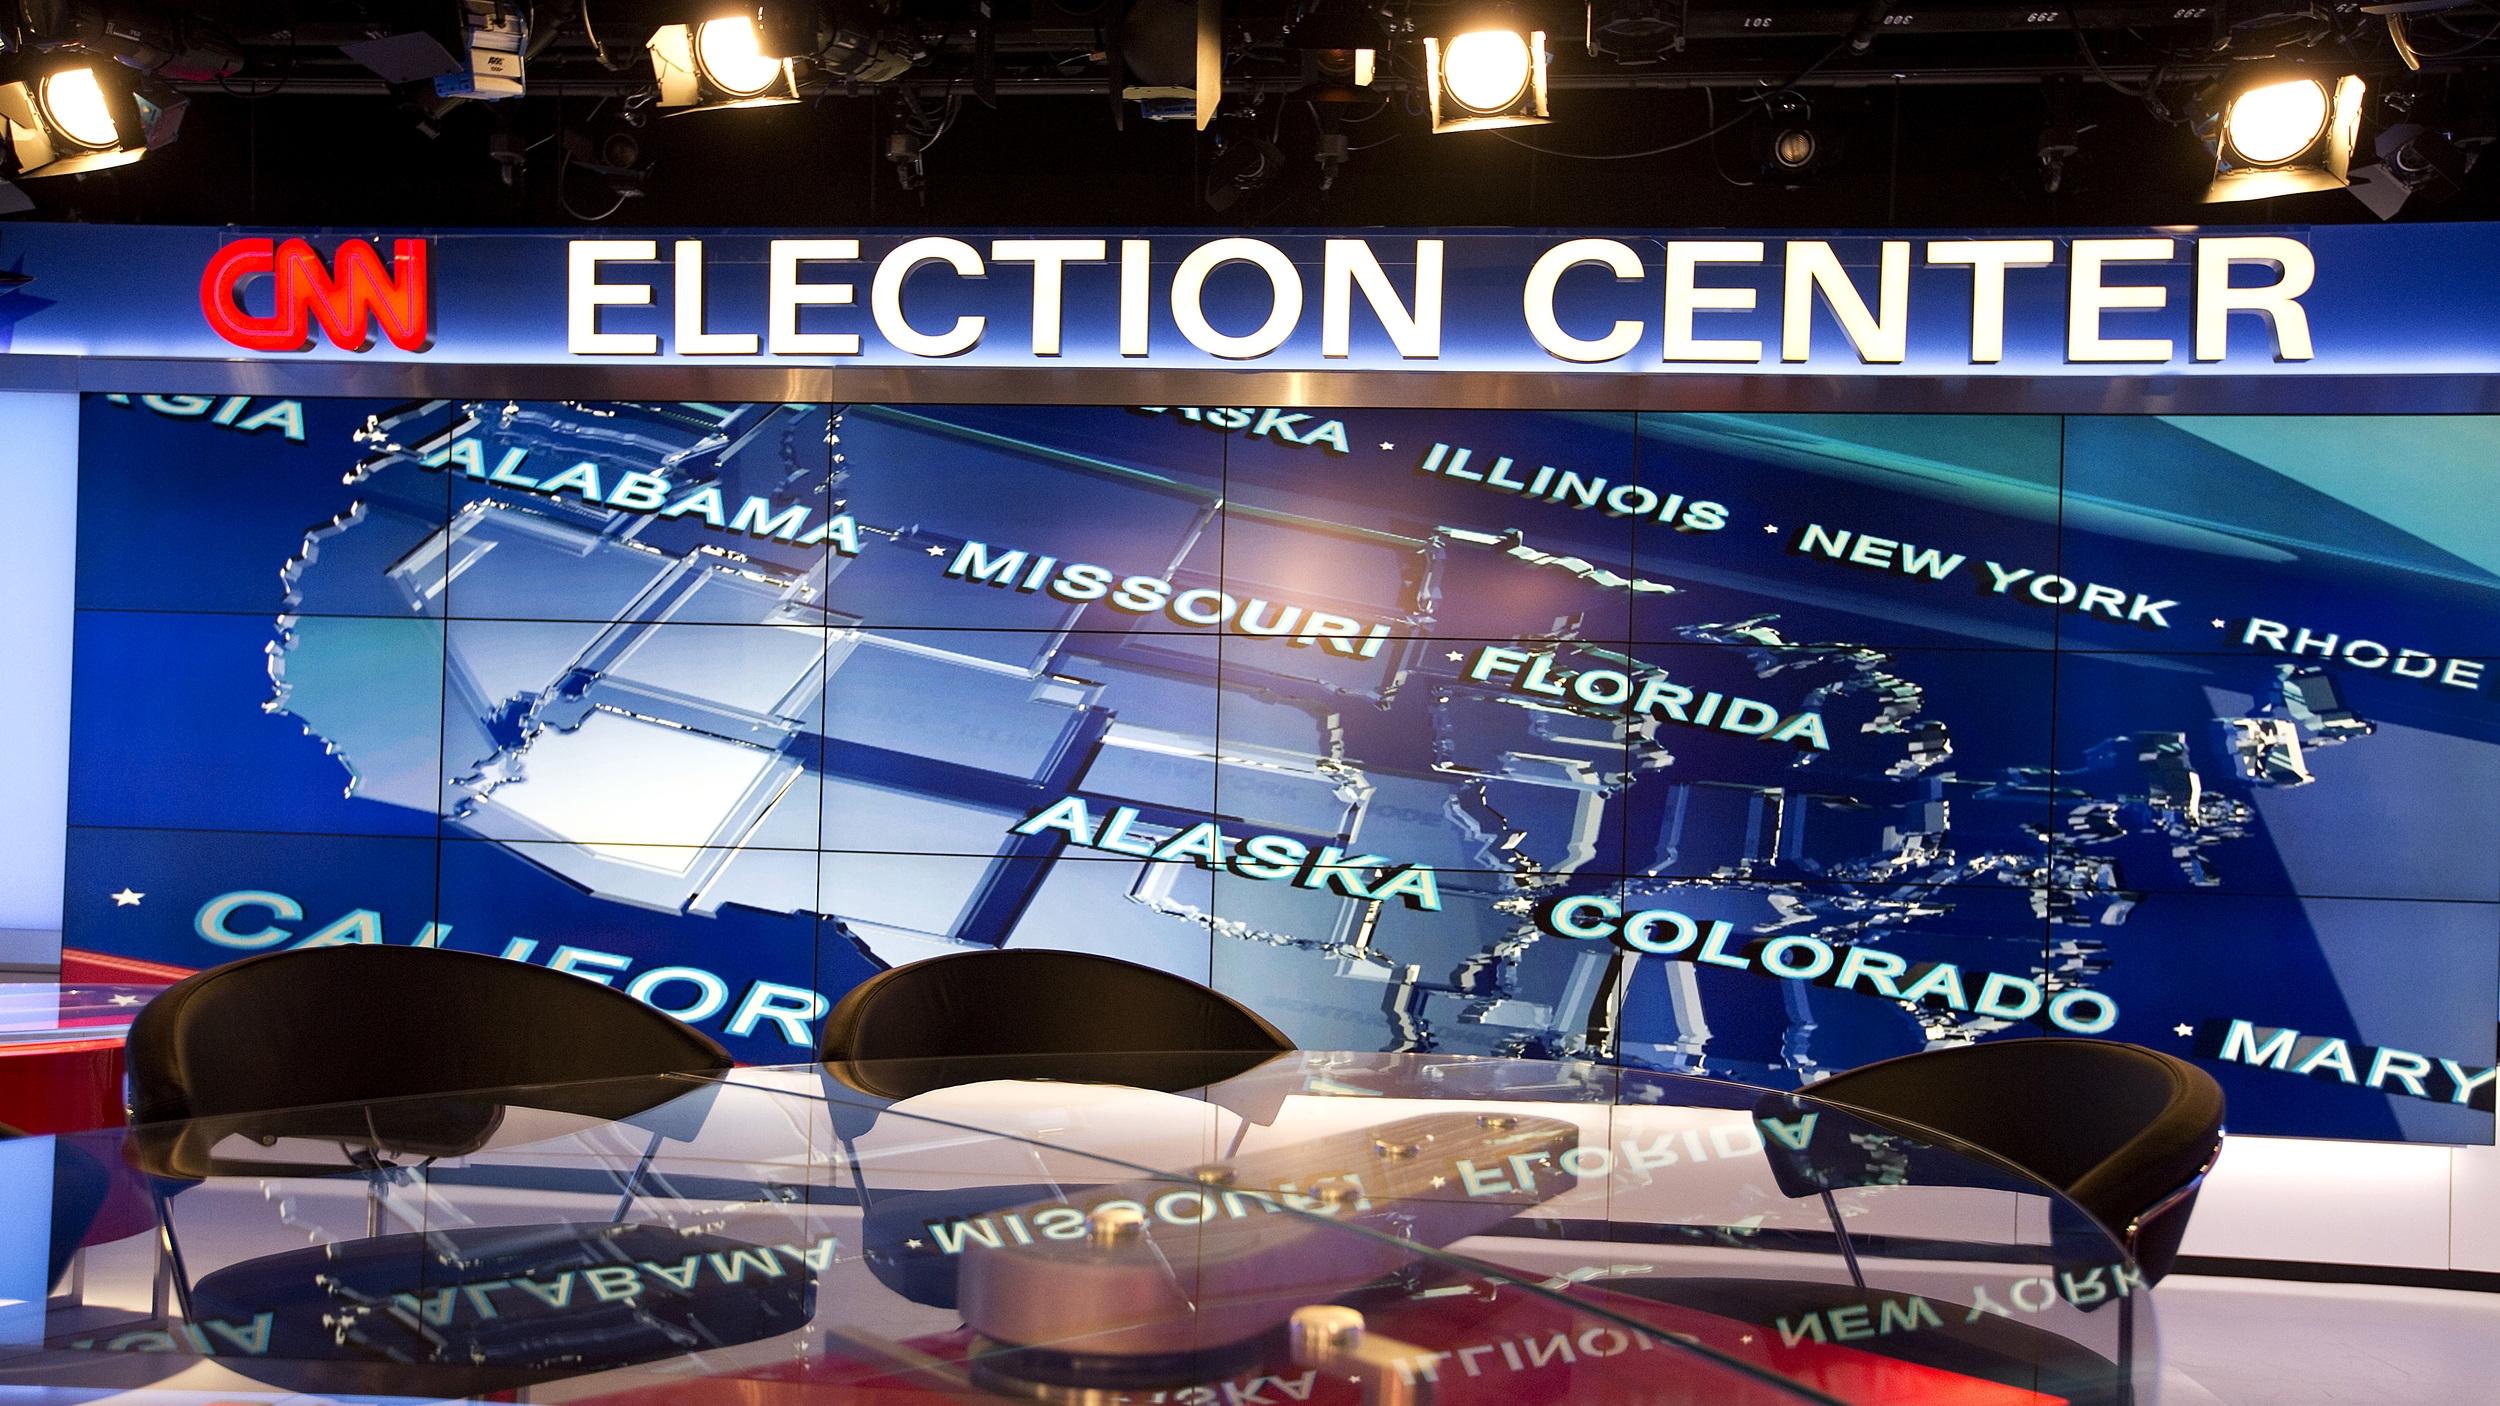 cnn_wdc_election_center17.JPG